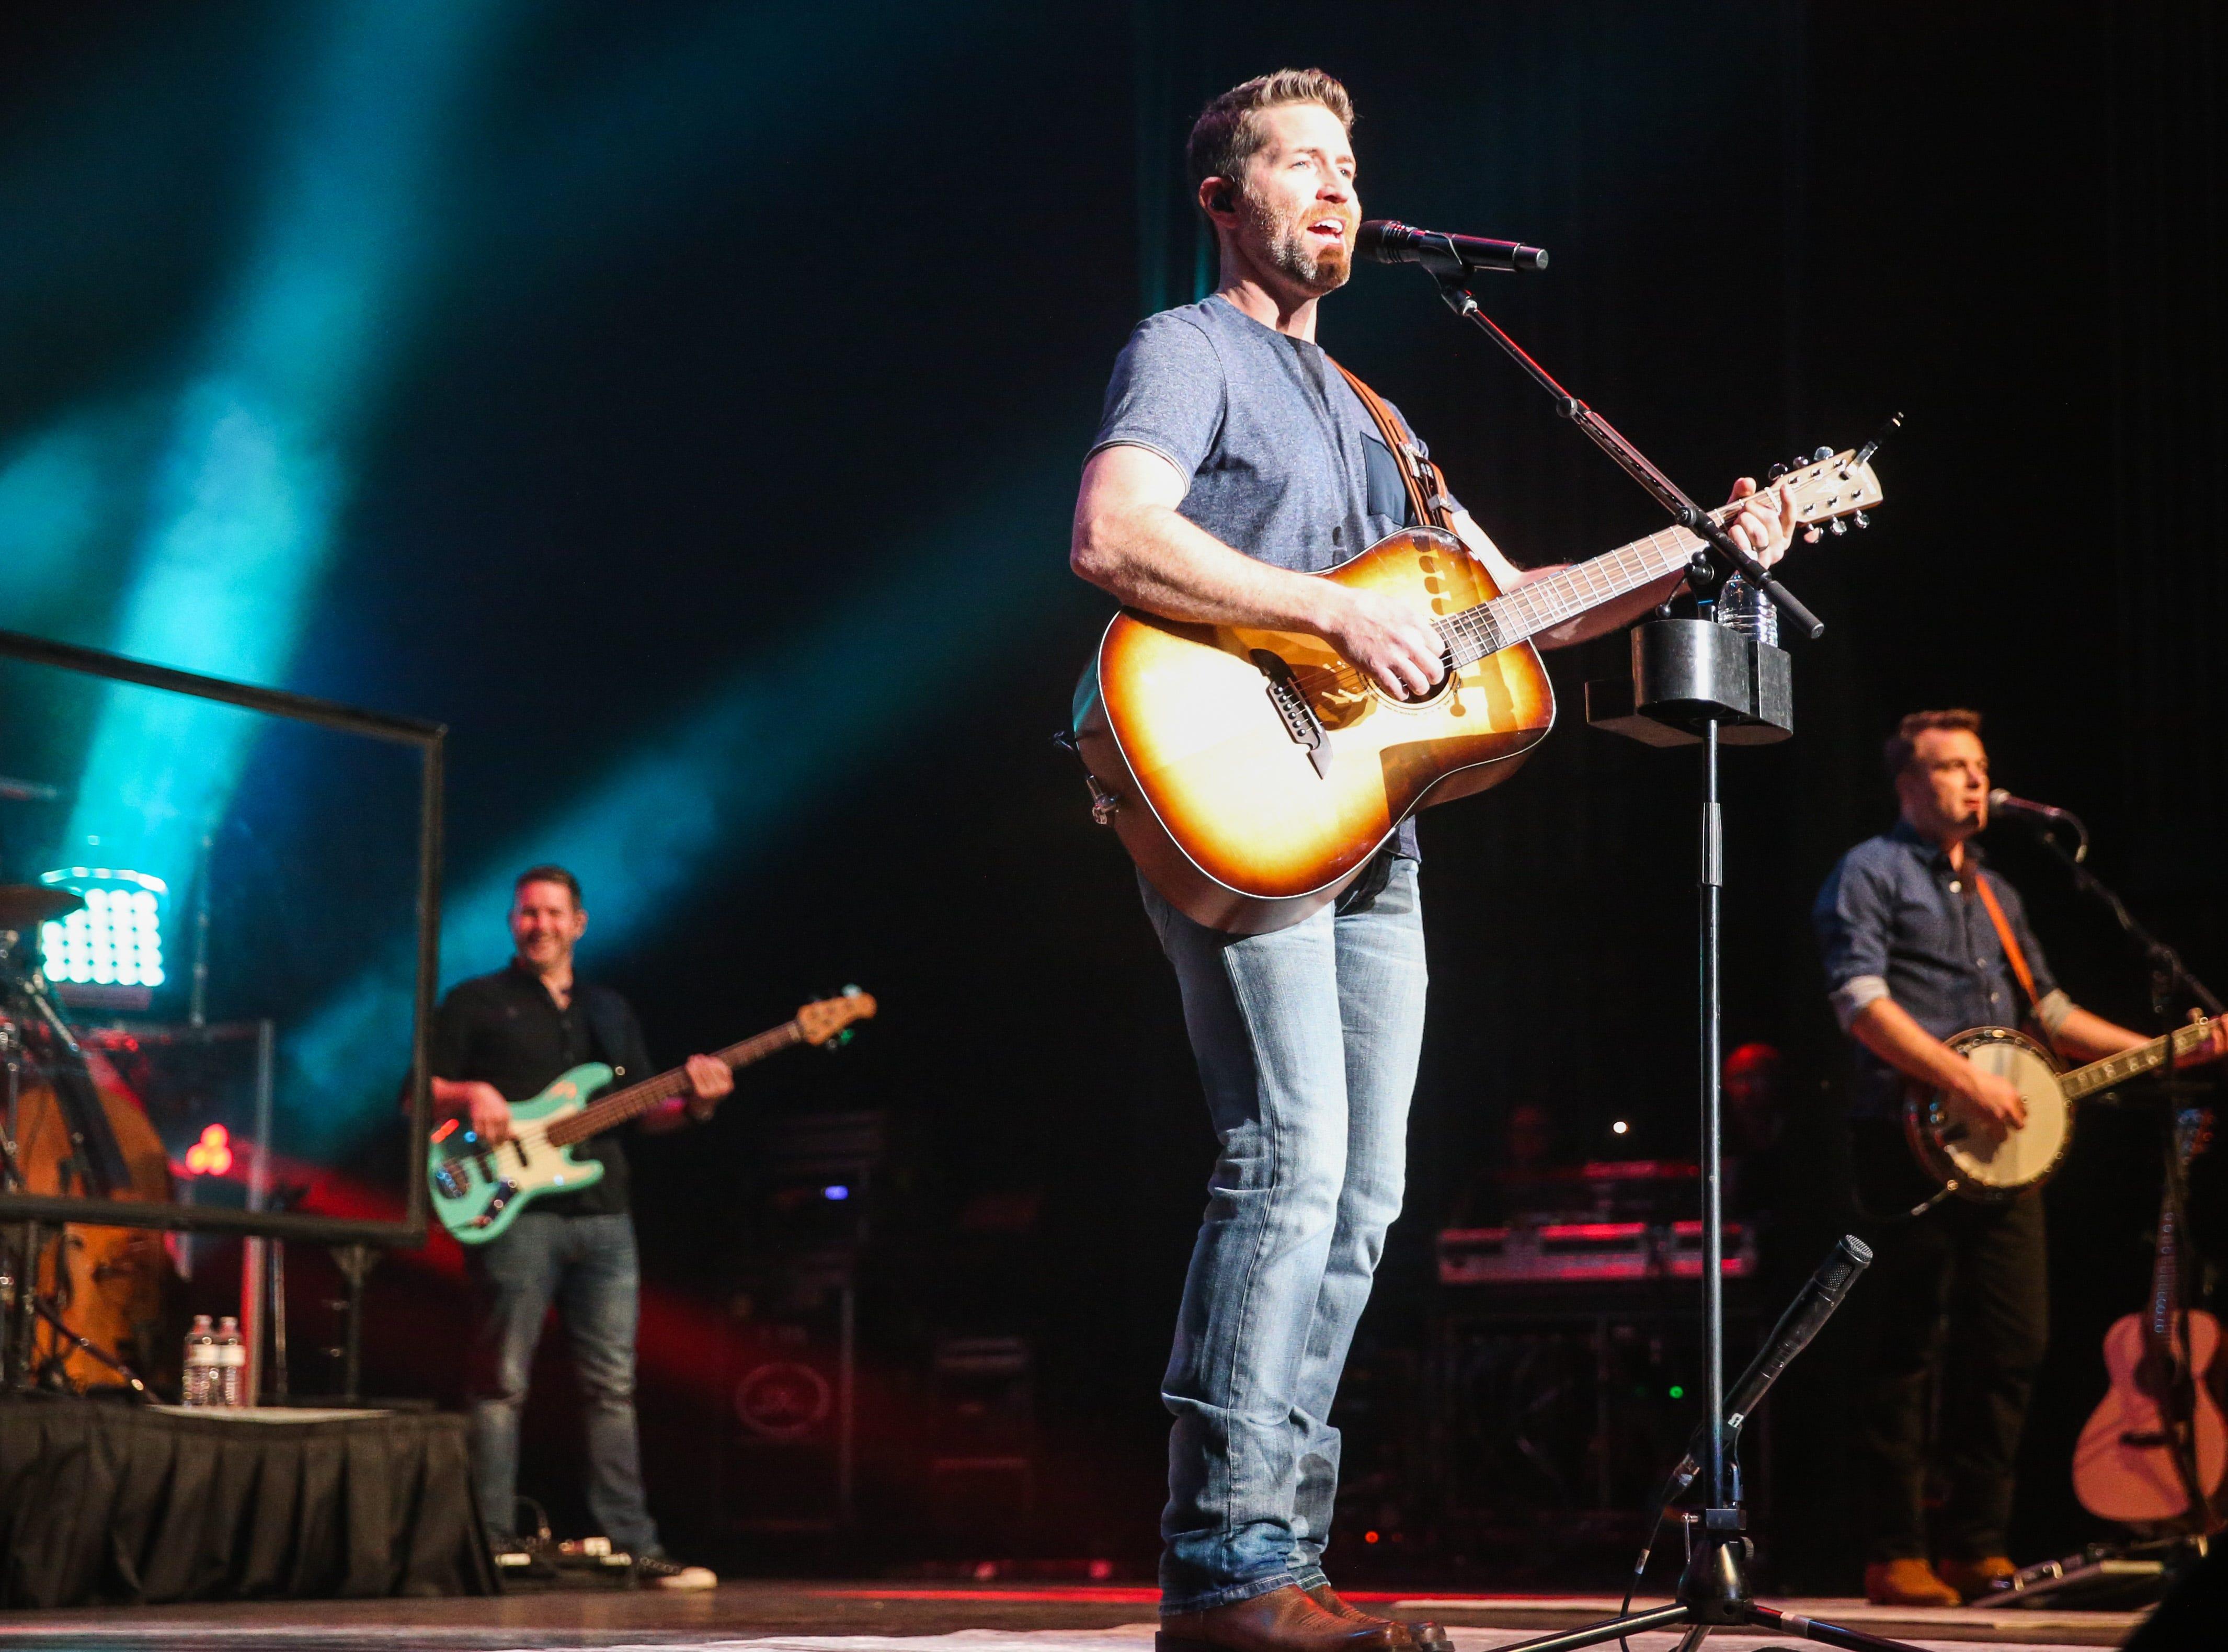 Josh Turner performs Friday, April 5, 2019, at Murphey Performance Hall.